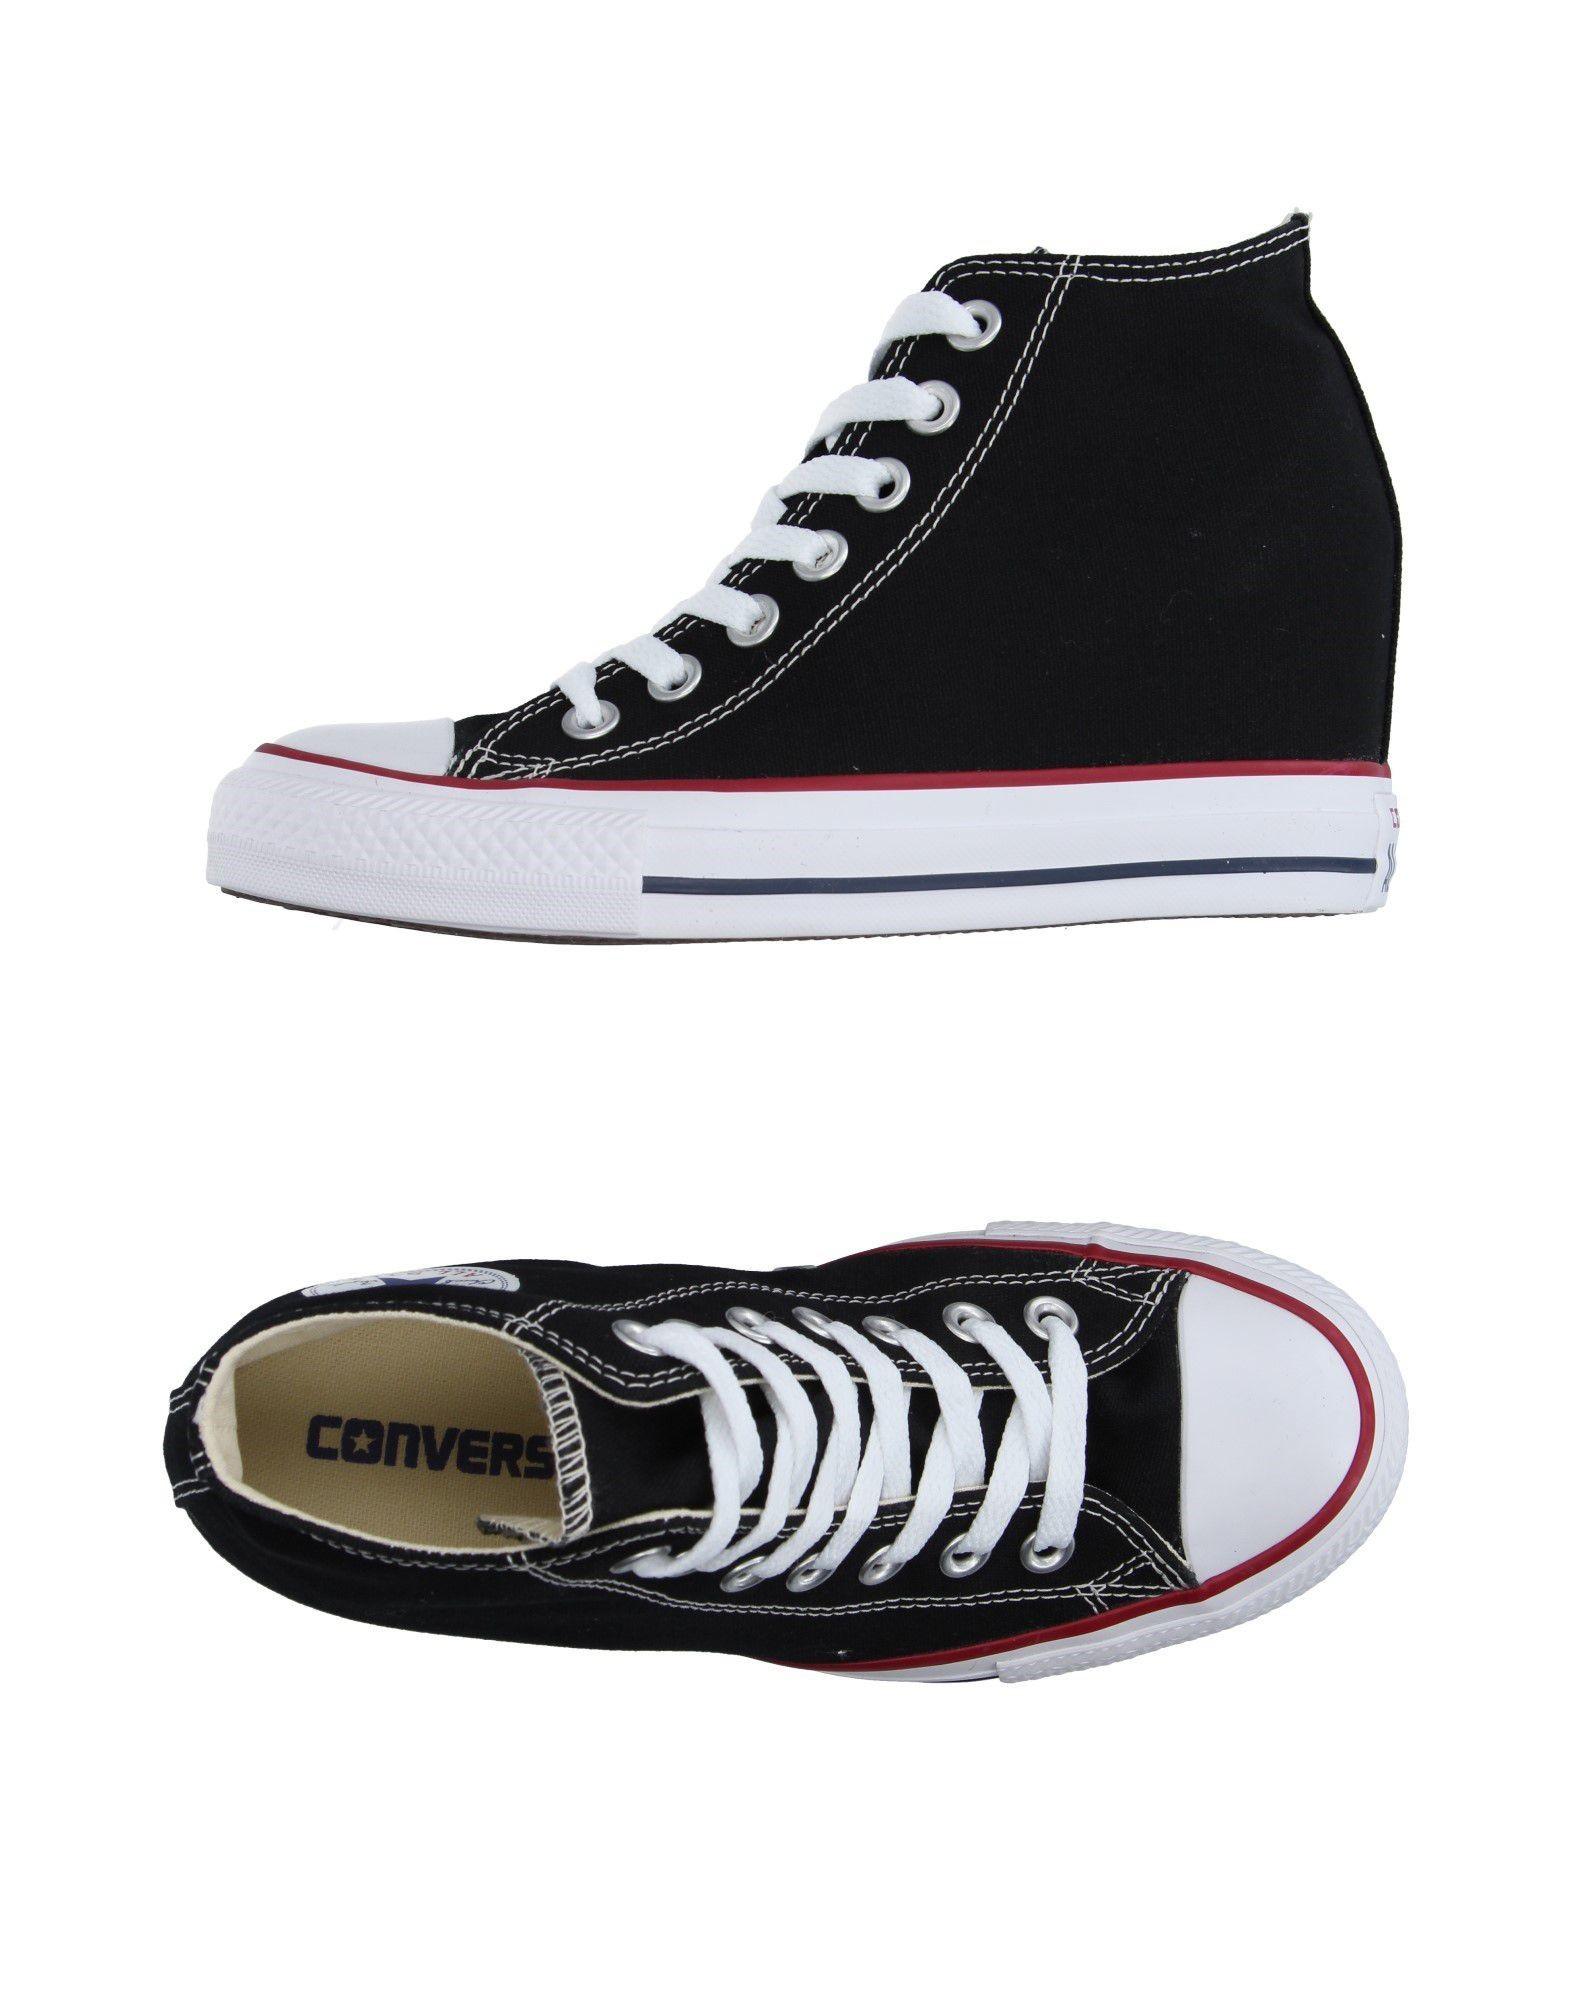 9028164232ef CONVERSE ALL STAR Sneakers Schwarz Damen Schuhe